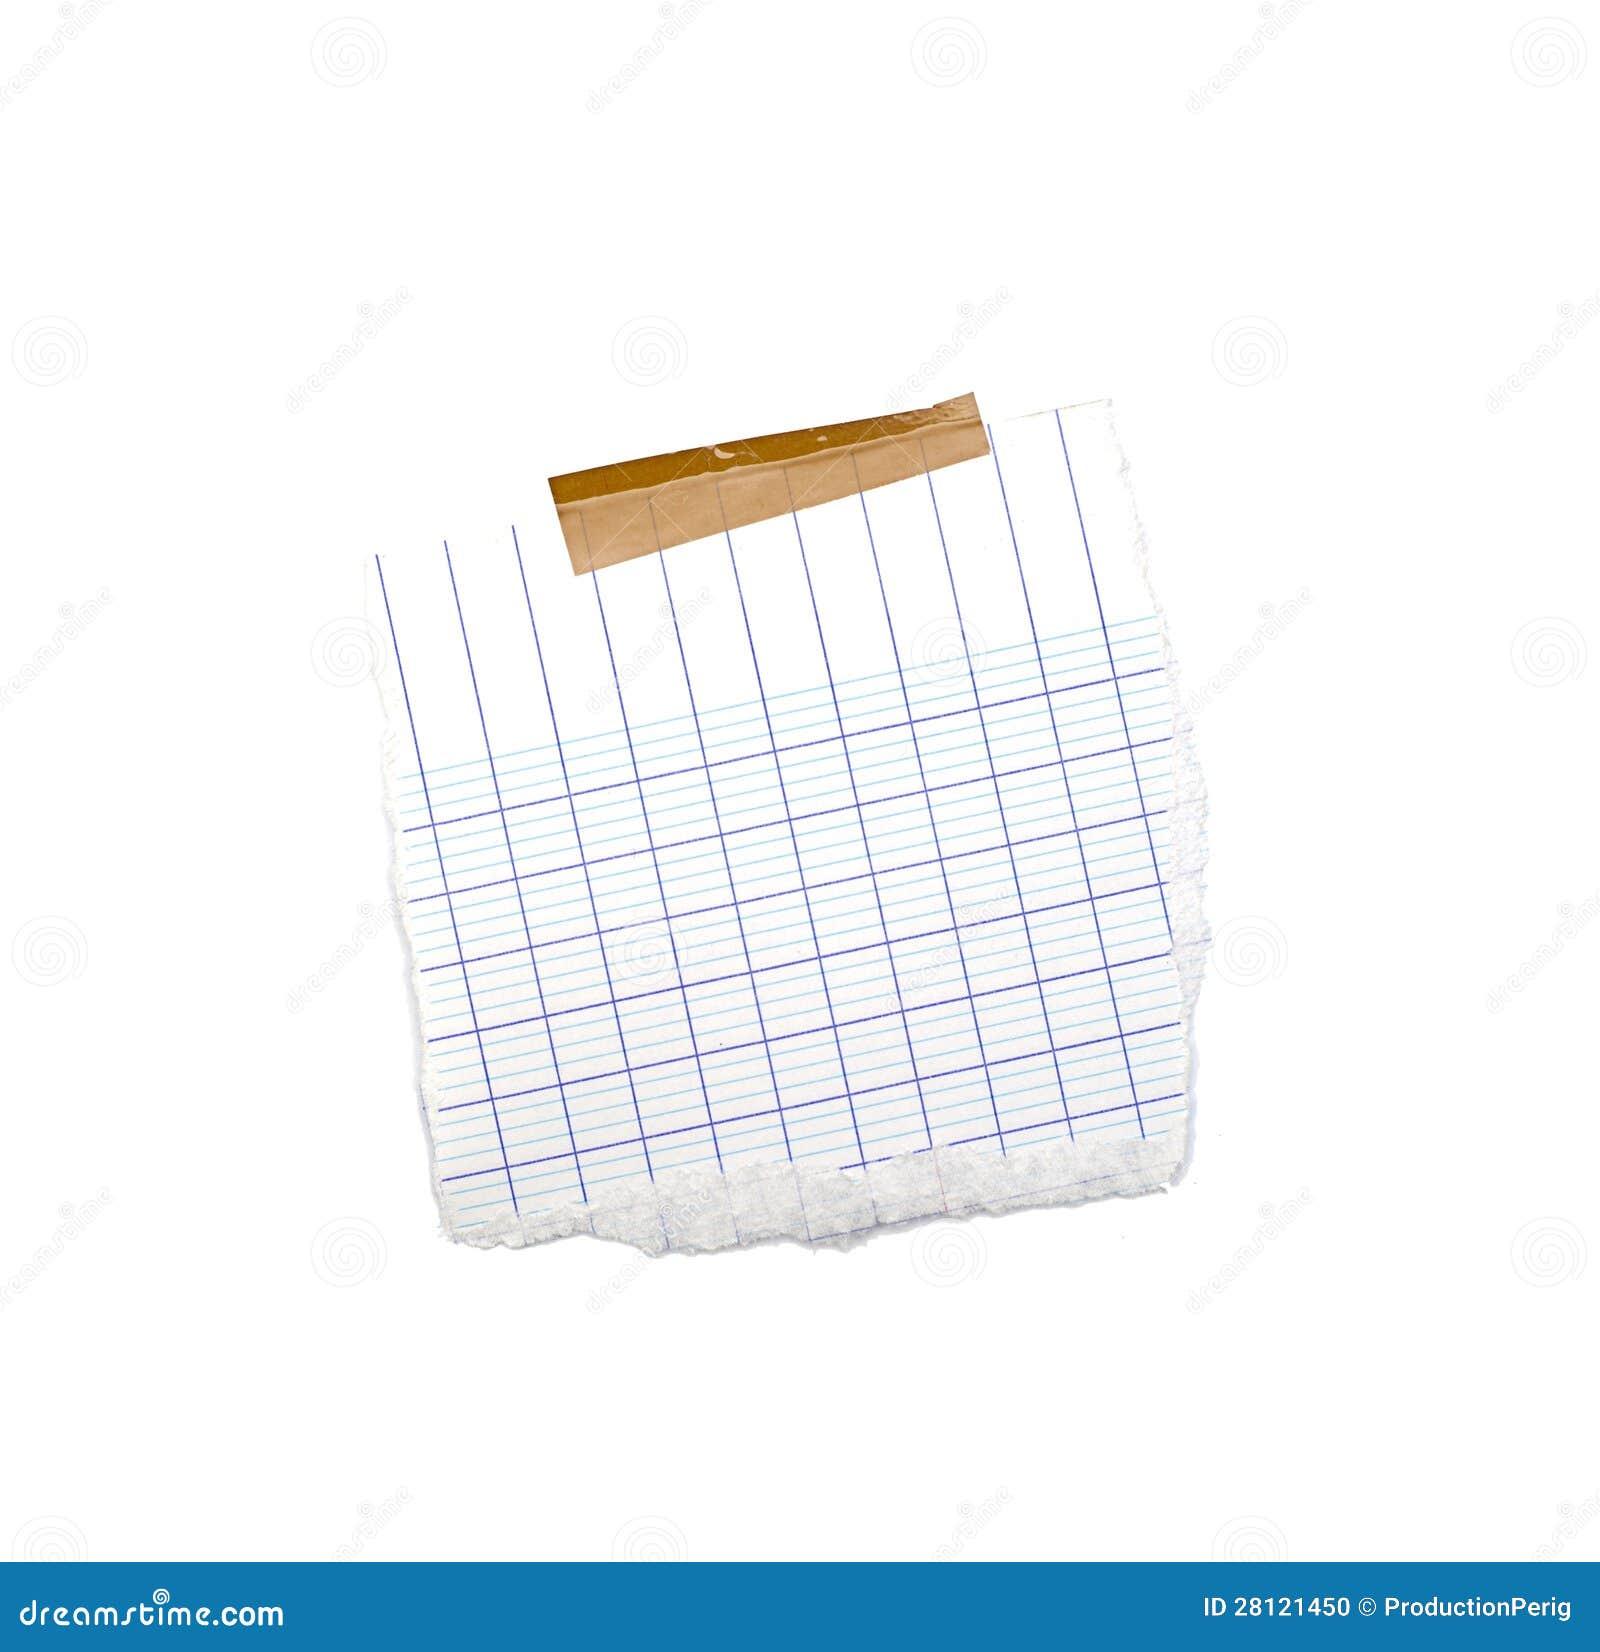 Wenig Blatt Papier hielt durch einen Kleber an